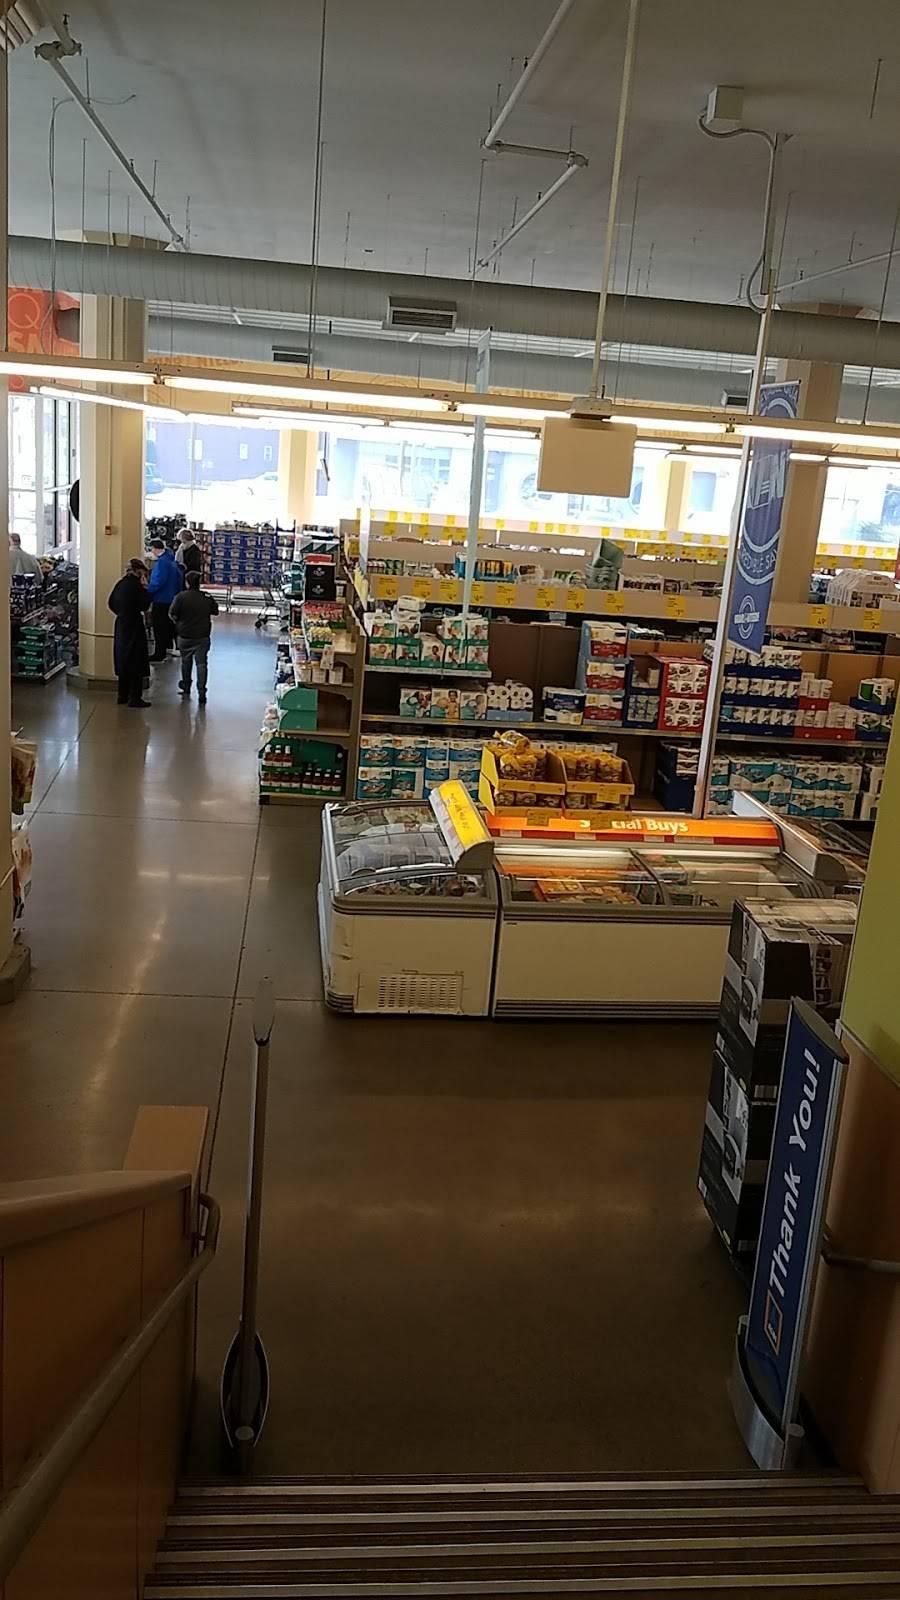 ALDI - supermarket  | Photo 3 of 7 | Address: 5631 Baum Blvd, Pittsburgh, PA 15206, USA | Phone: (855) 955-2534